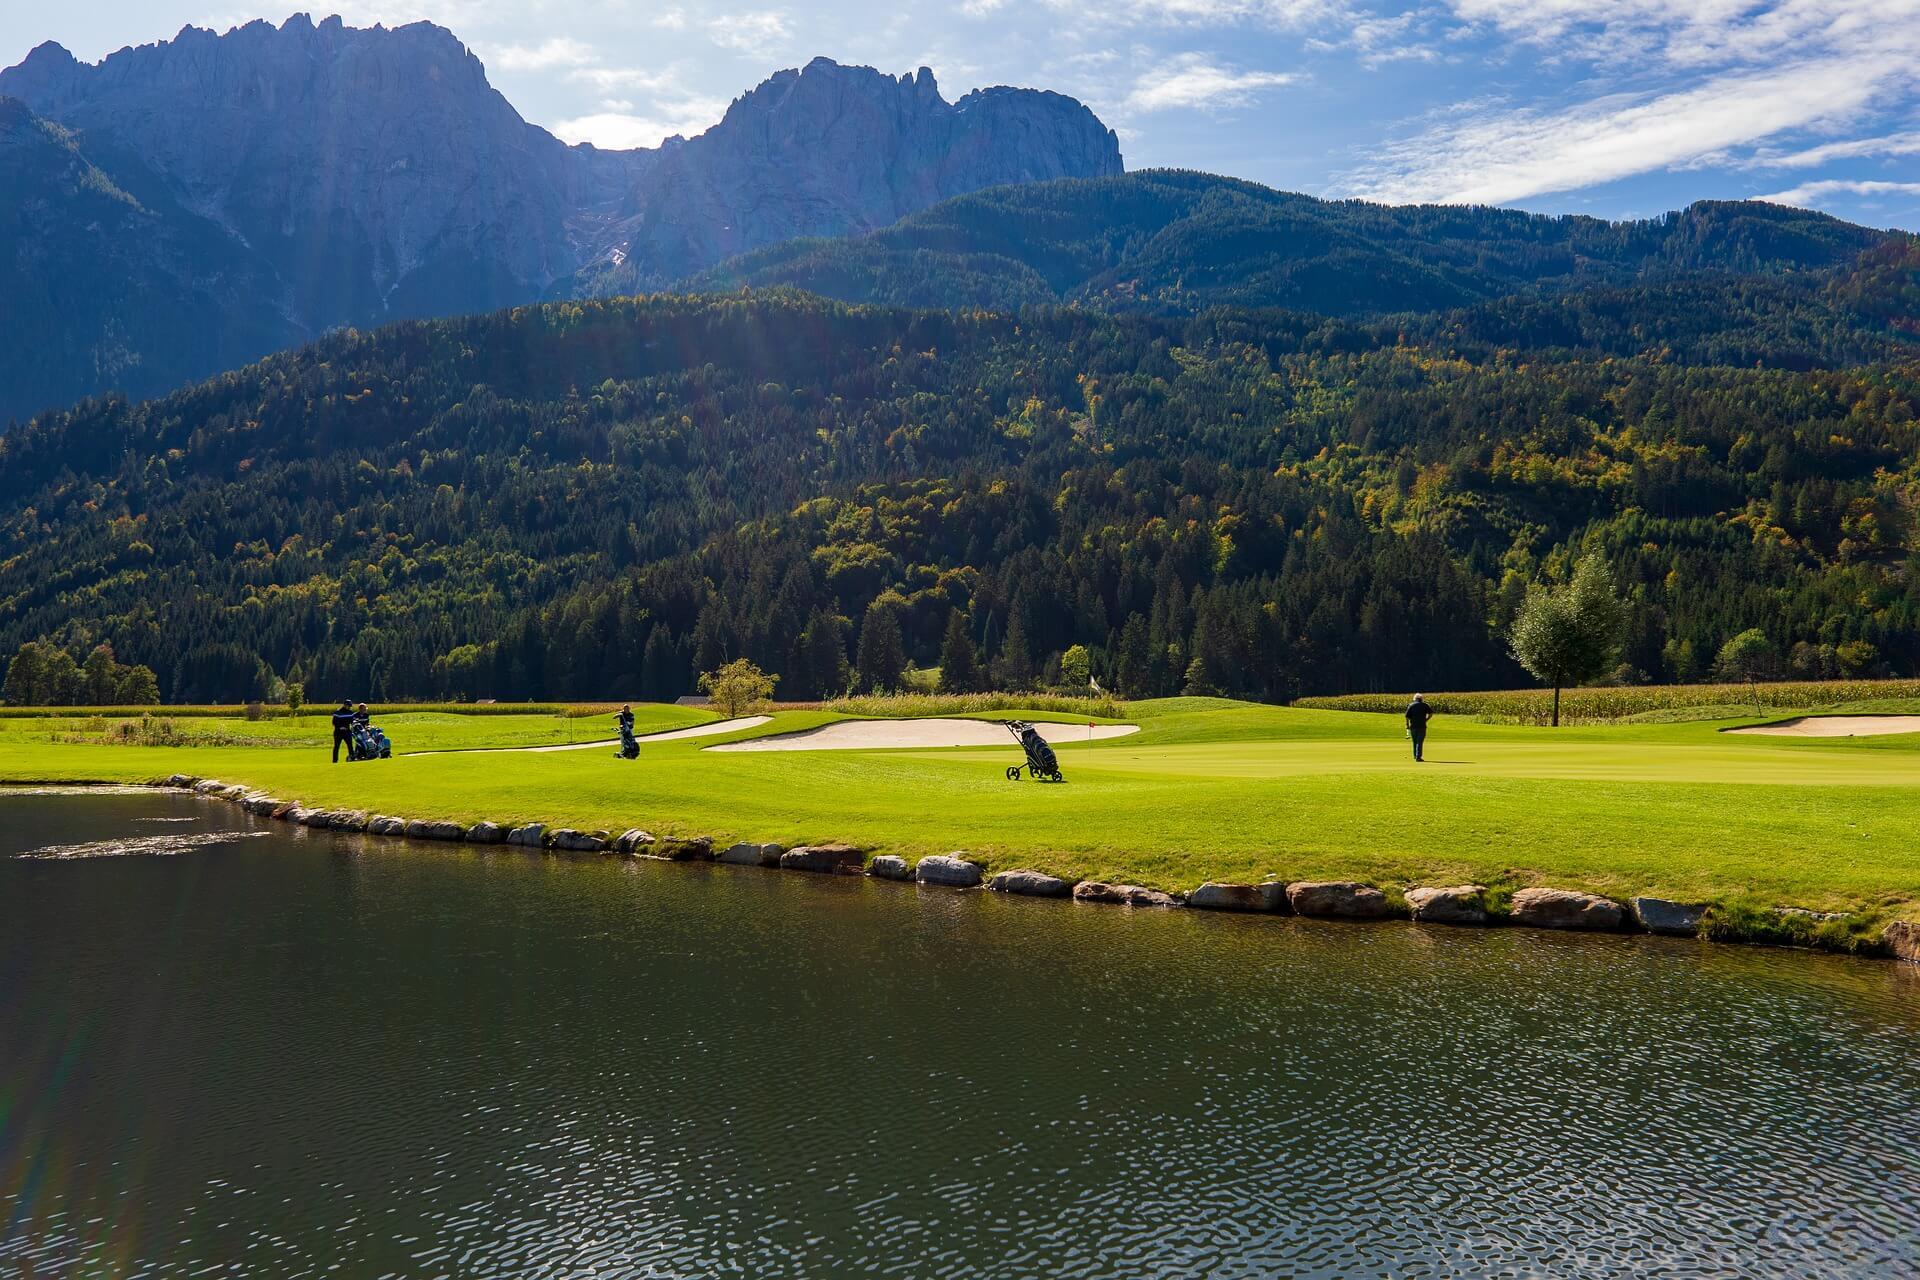 Golfen in Osttirol -  Golfclub Dolomitengolf Osttirol   © Pixapay